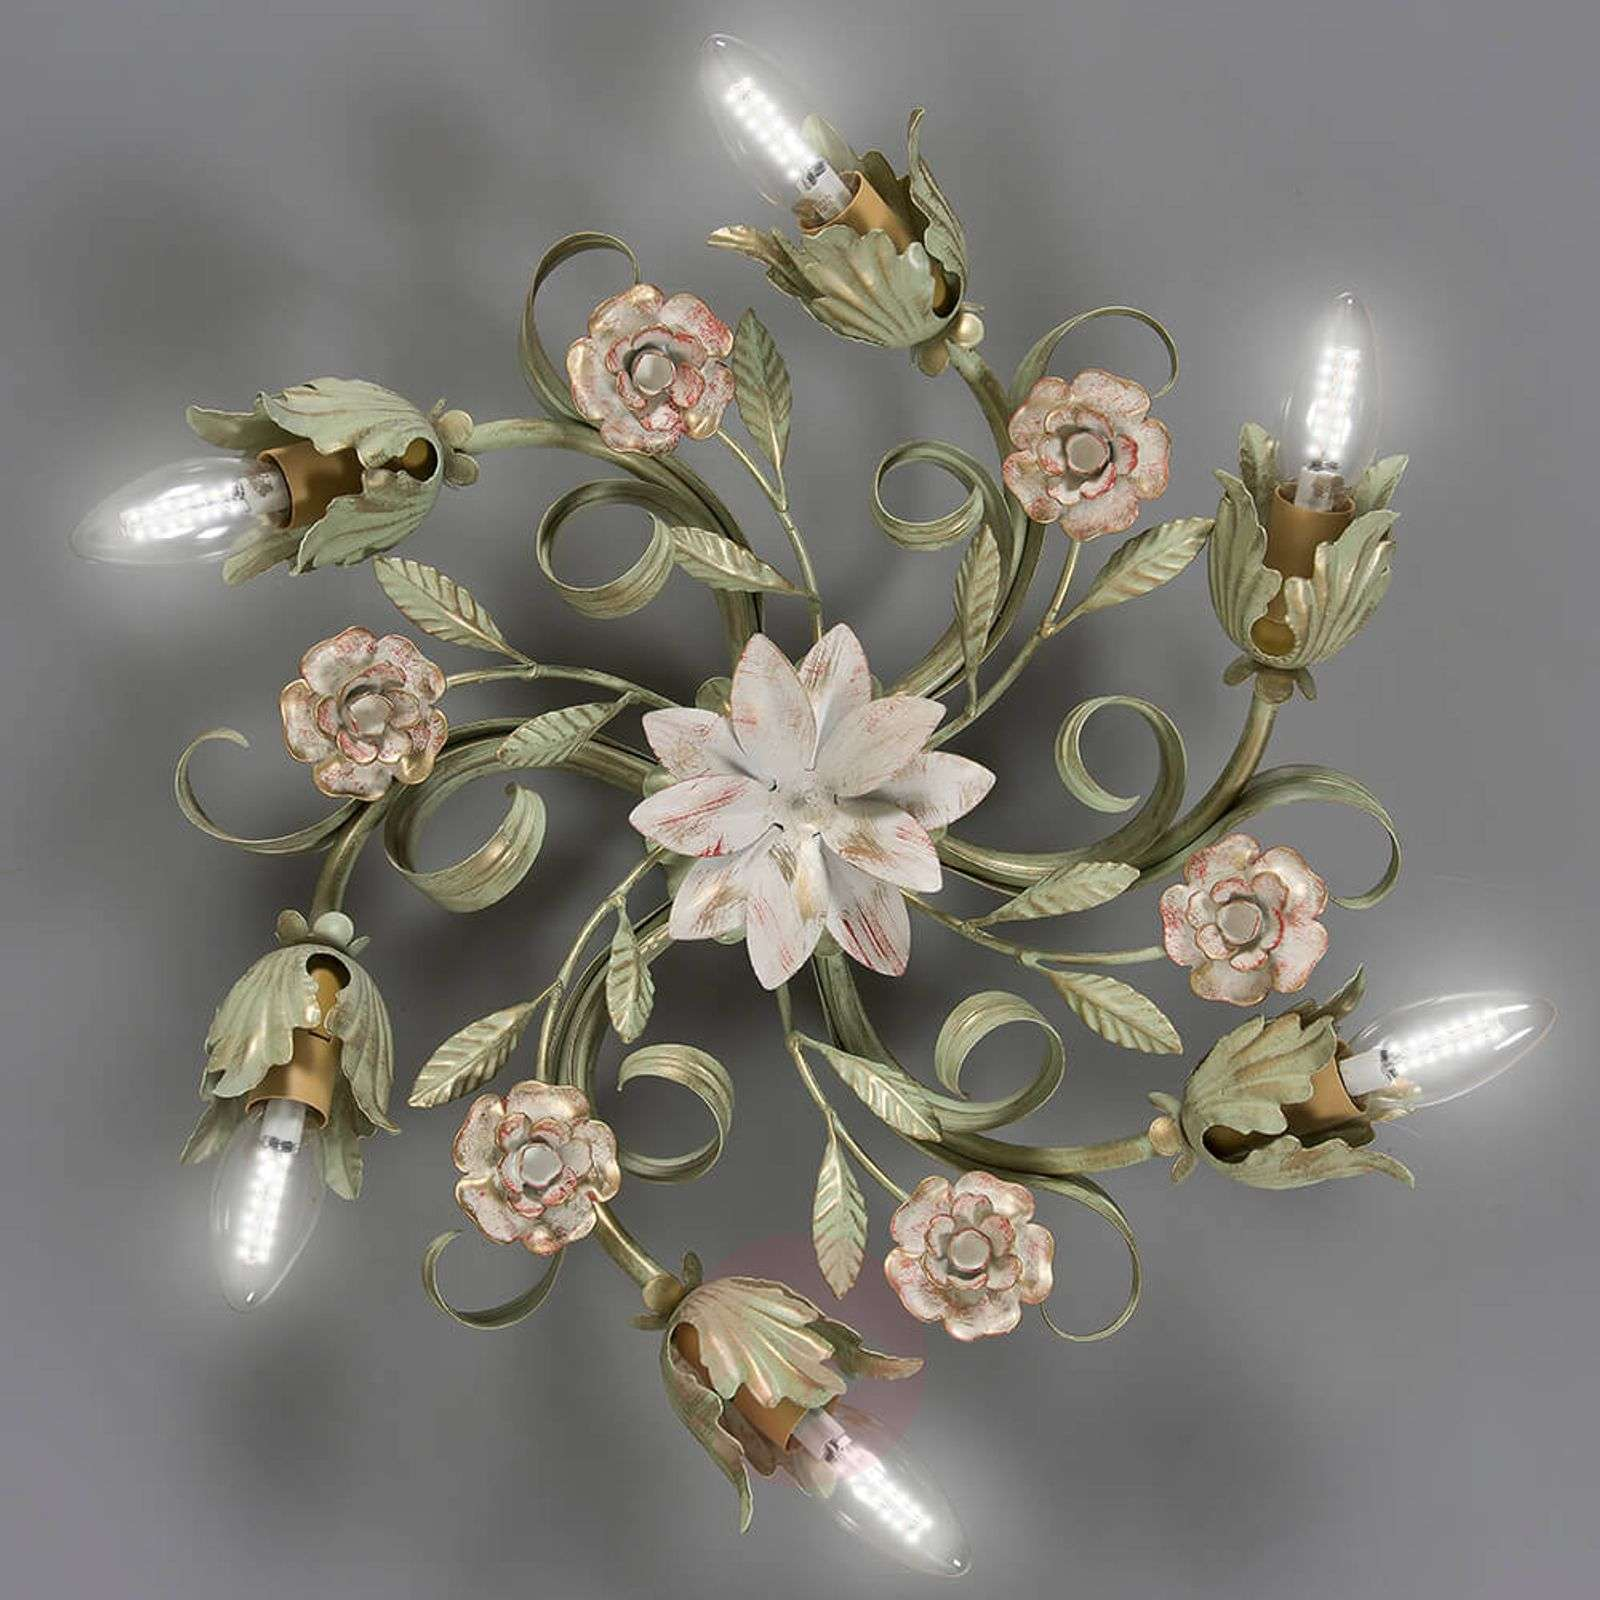 Tulipe floral ceiling light with six bulbs-3532168-01